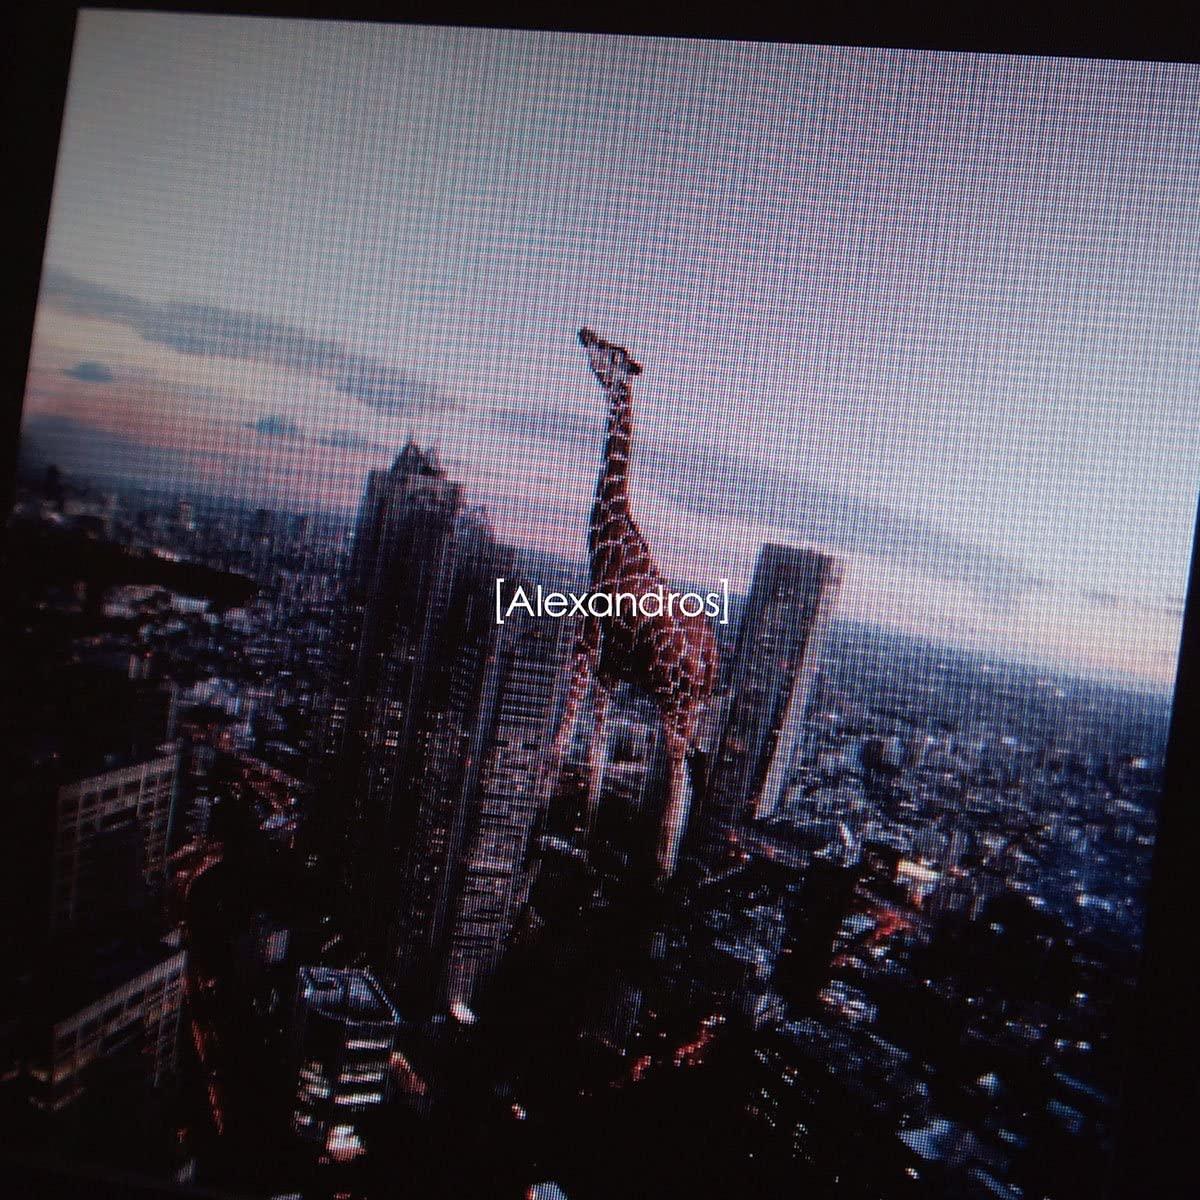 [Alexandros] 『starrrrrrr/涙がこぼれそう』、RX-RECORDS/UK.PROJECT、2013年